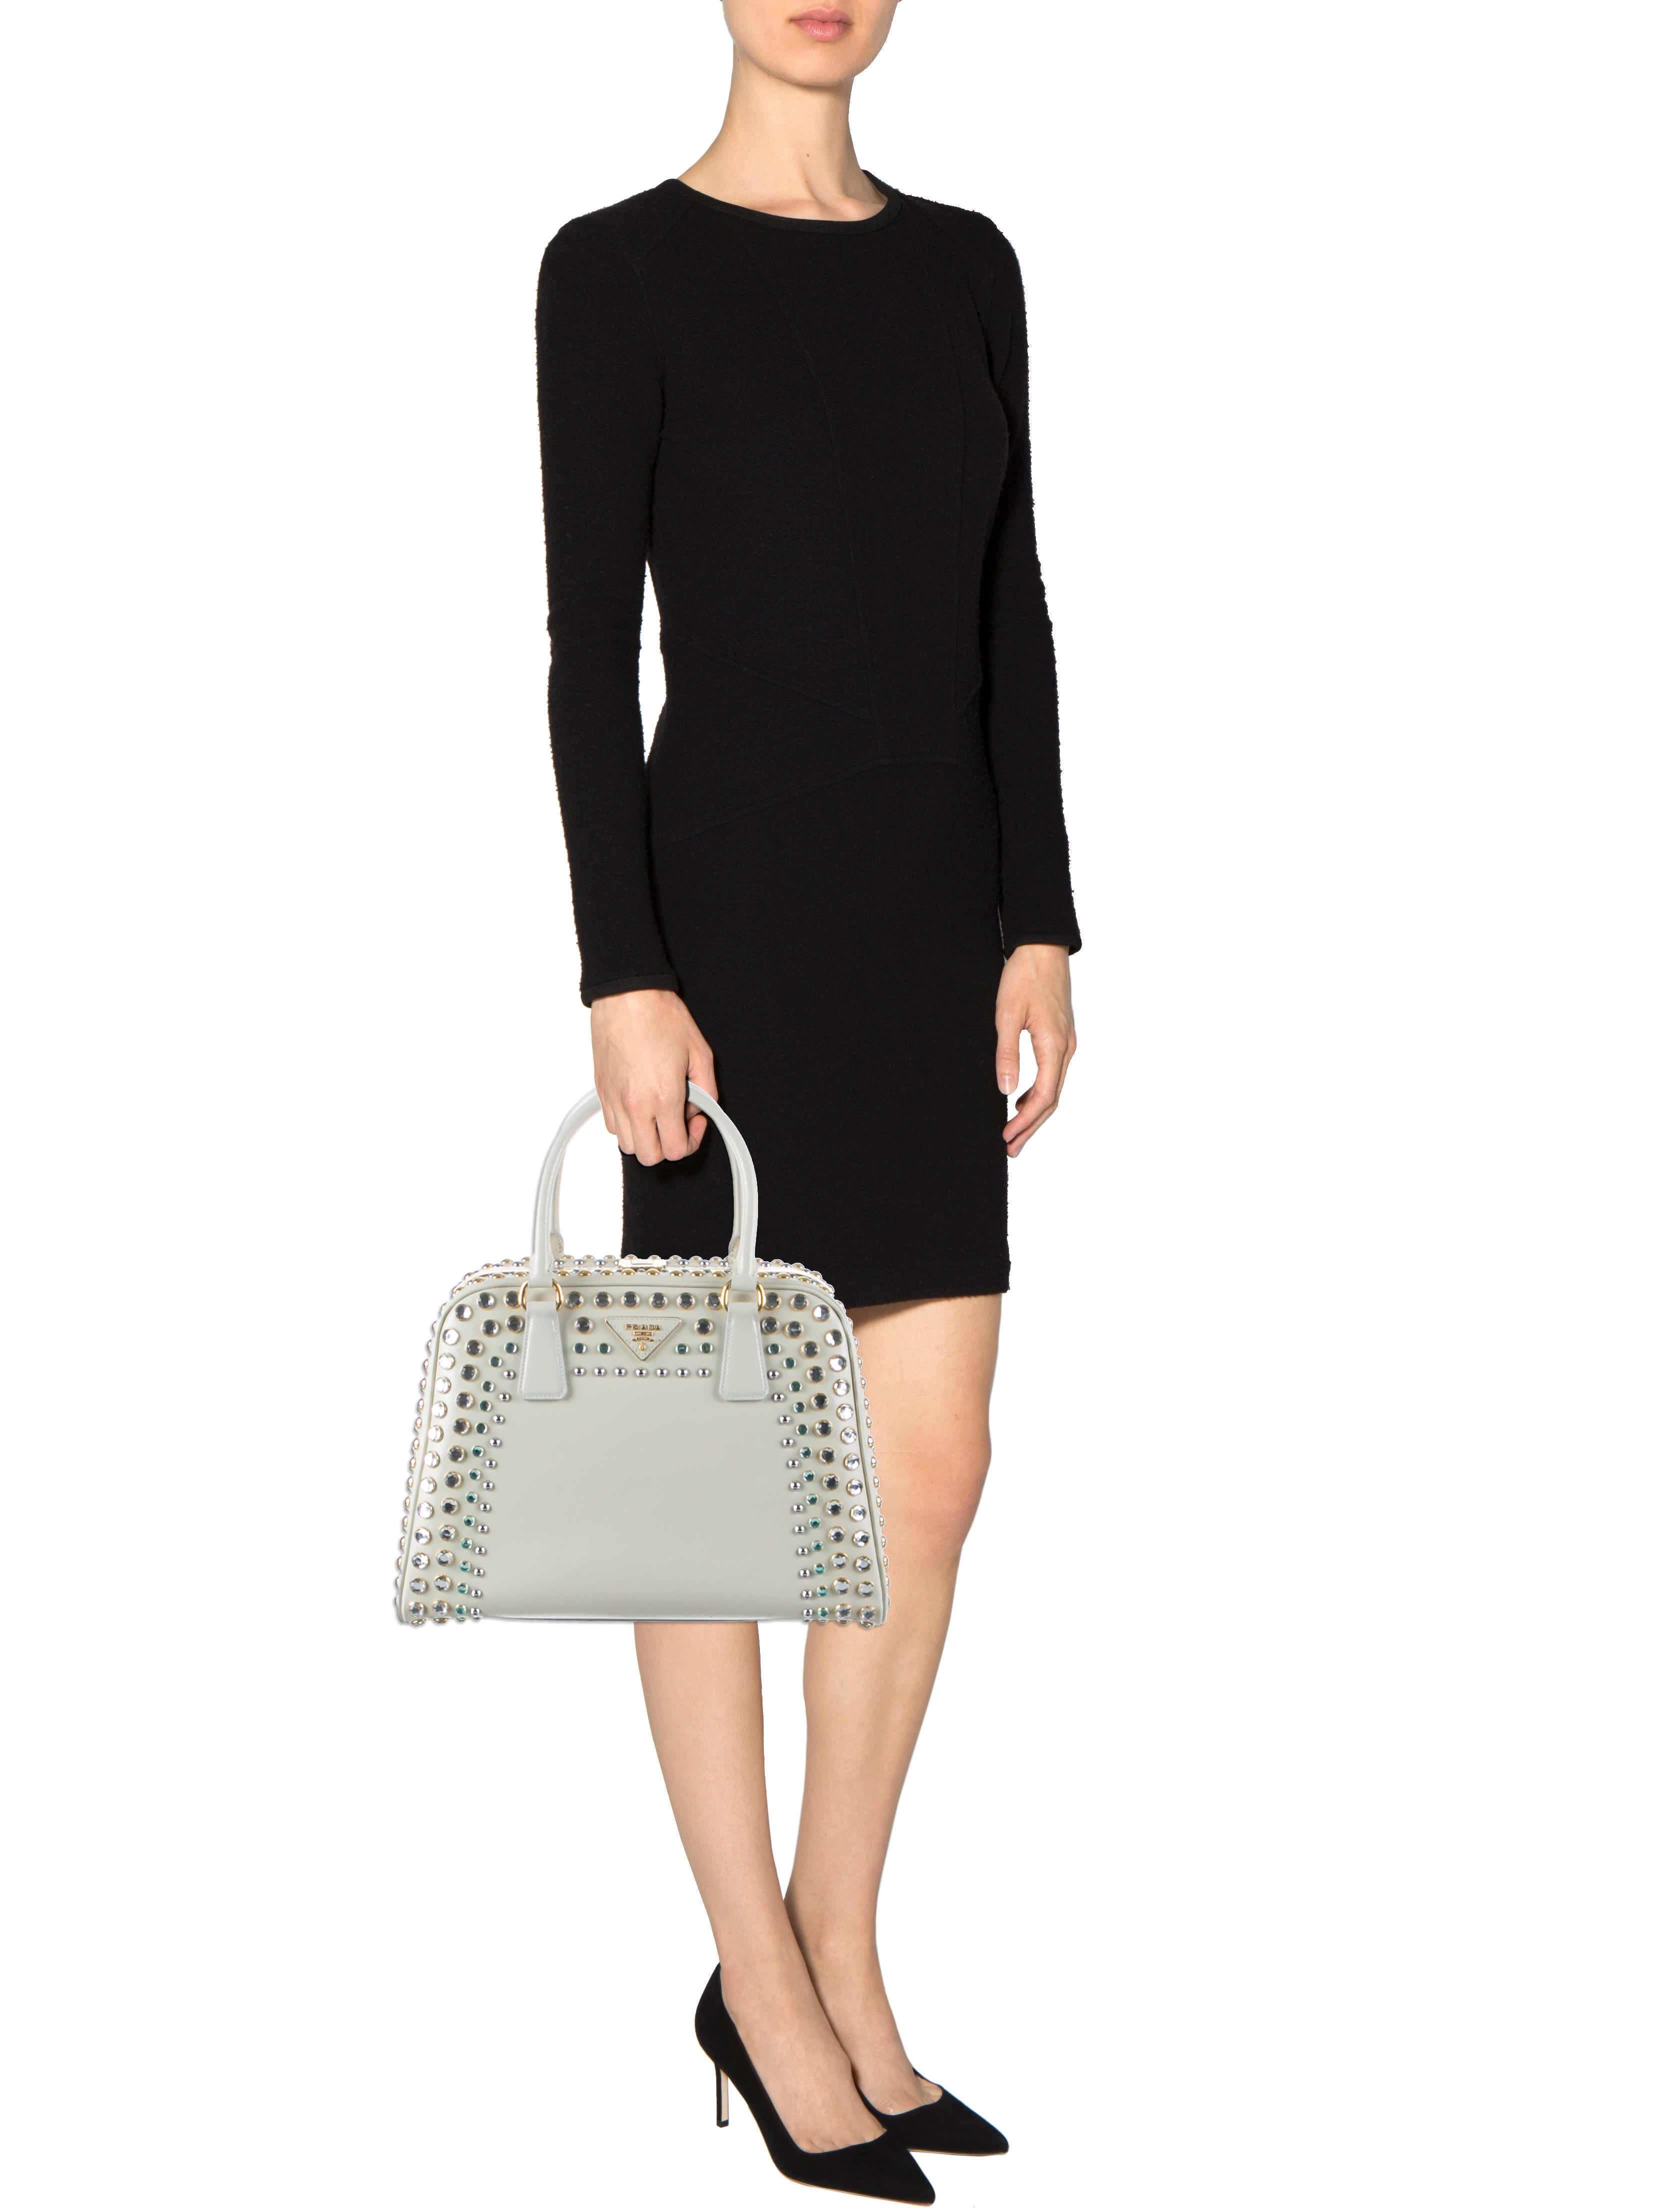 Prada Borsa Cerniera Pyramid Bag - Handbags - PRA59763 | The RealReal